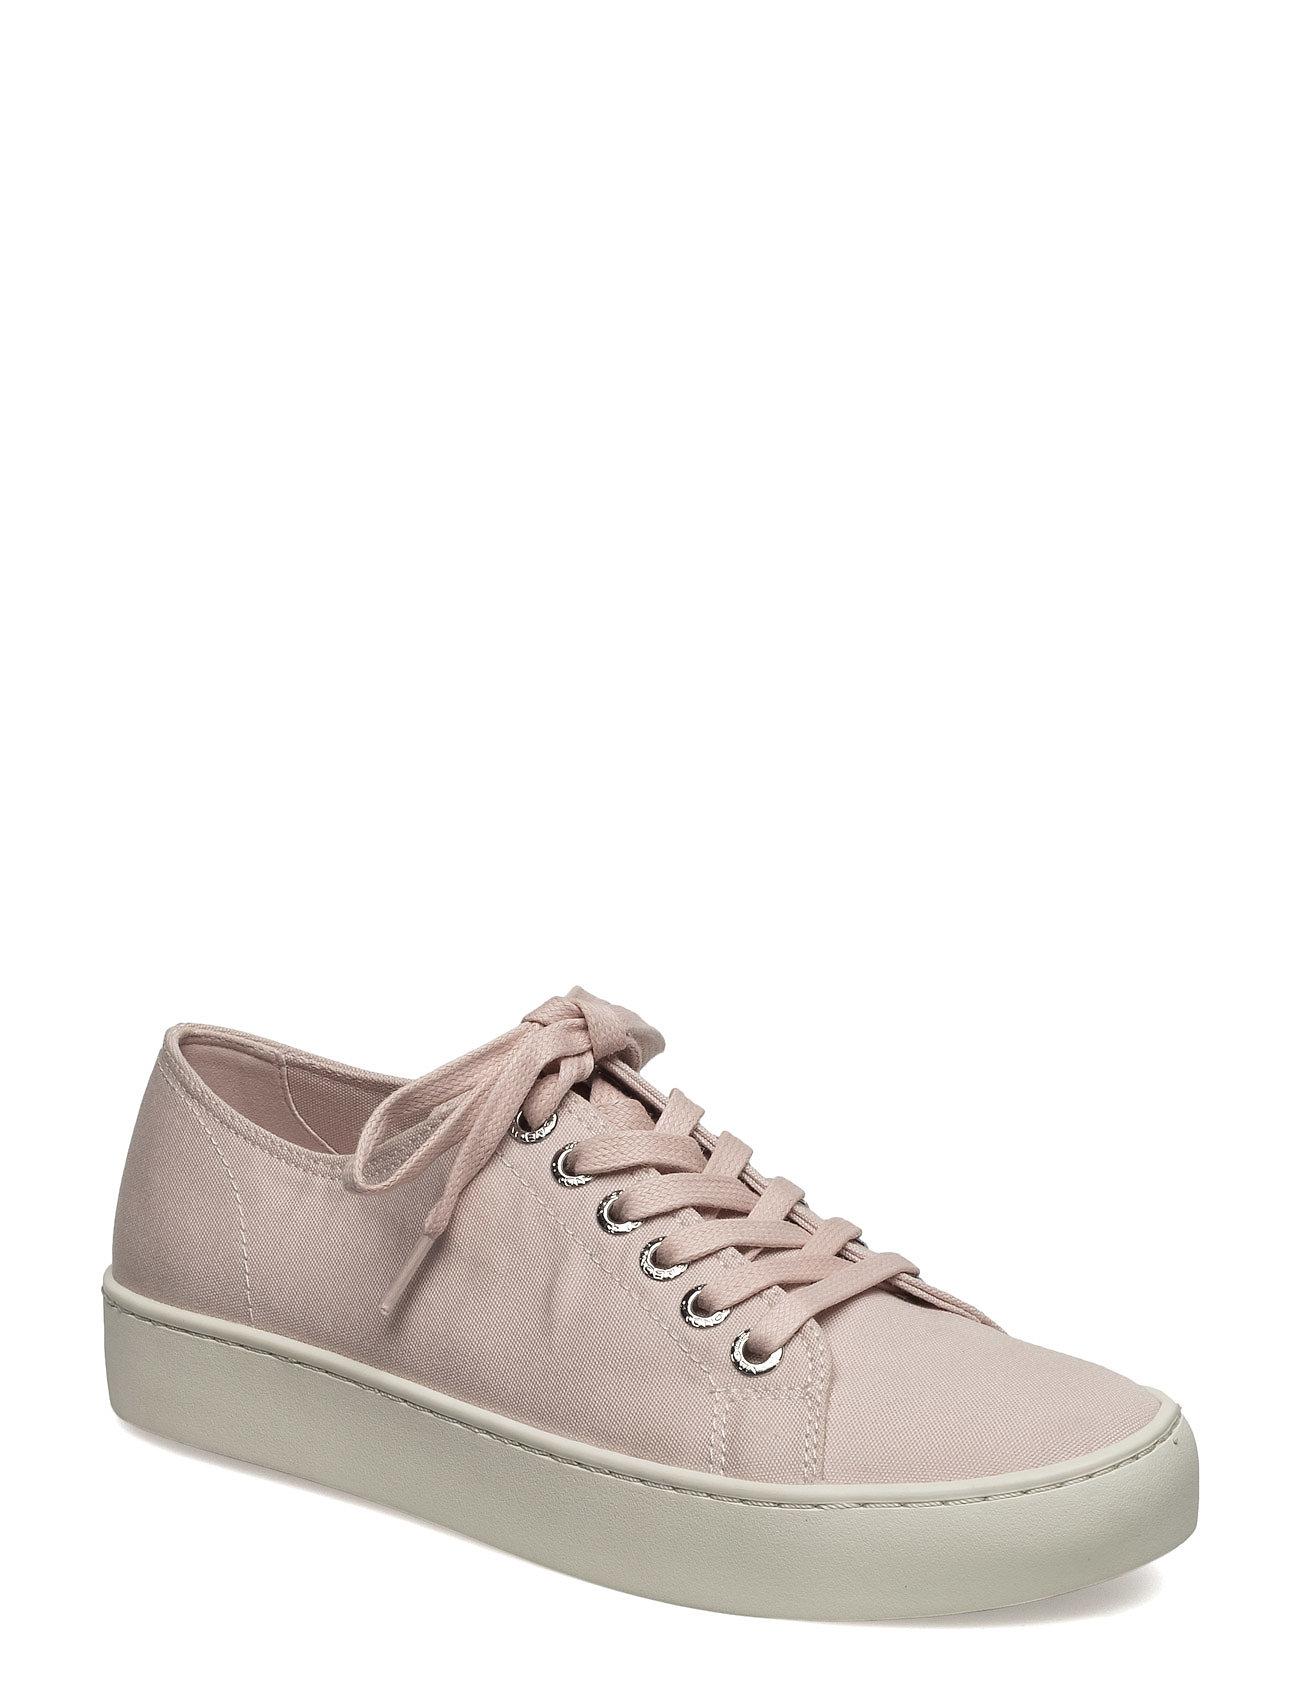 Ruby VAGABOND Sneakers til Damer i